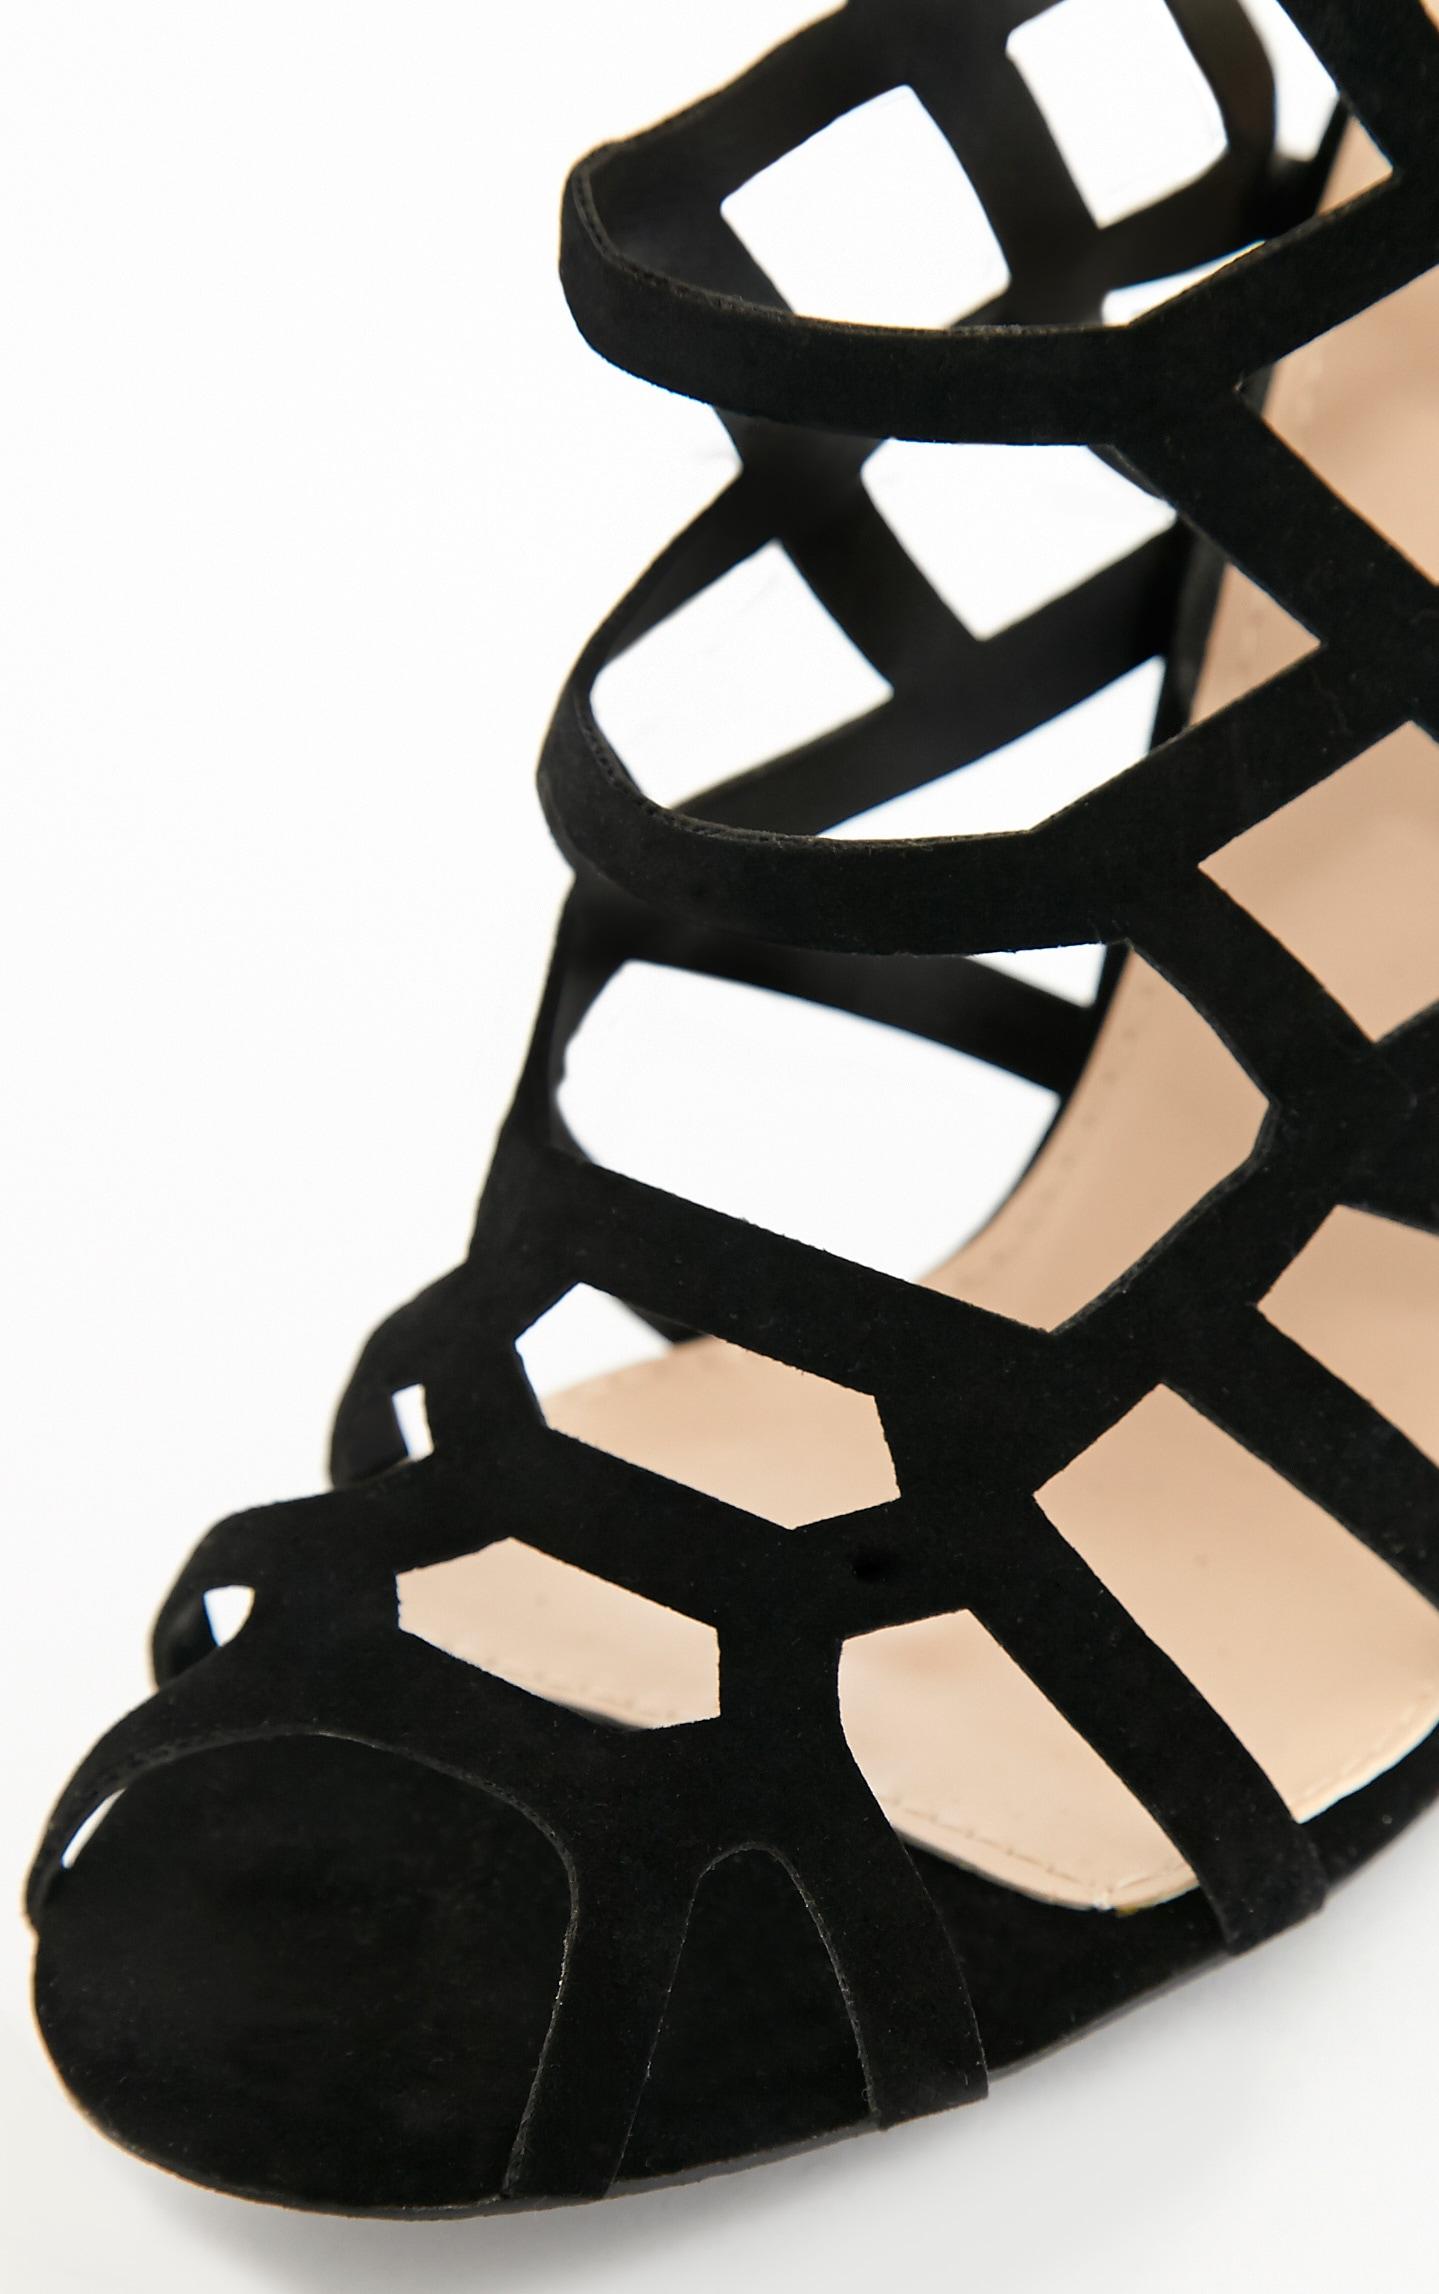 Haiti Black Suede Strappy Caged Heels 7